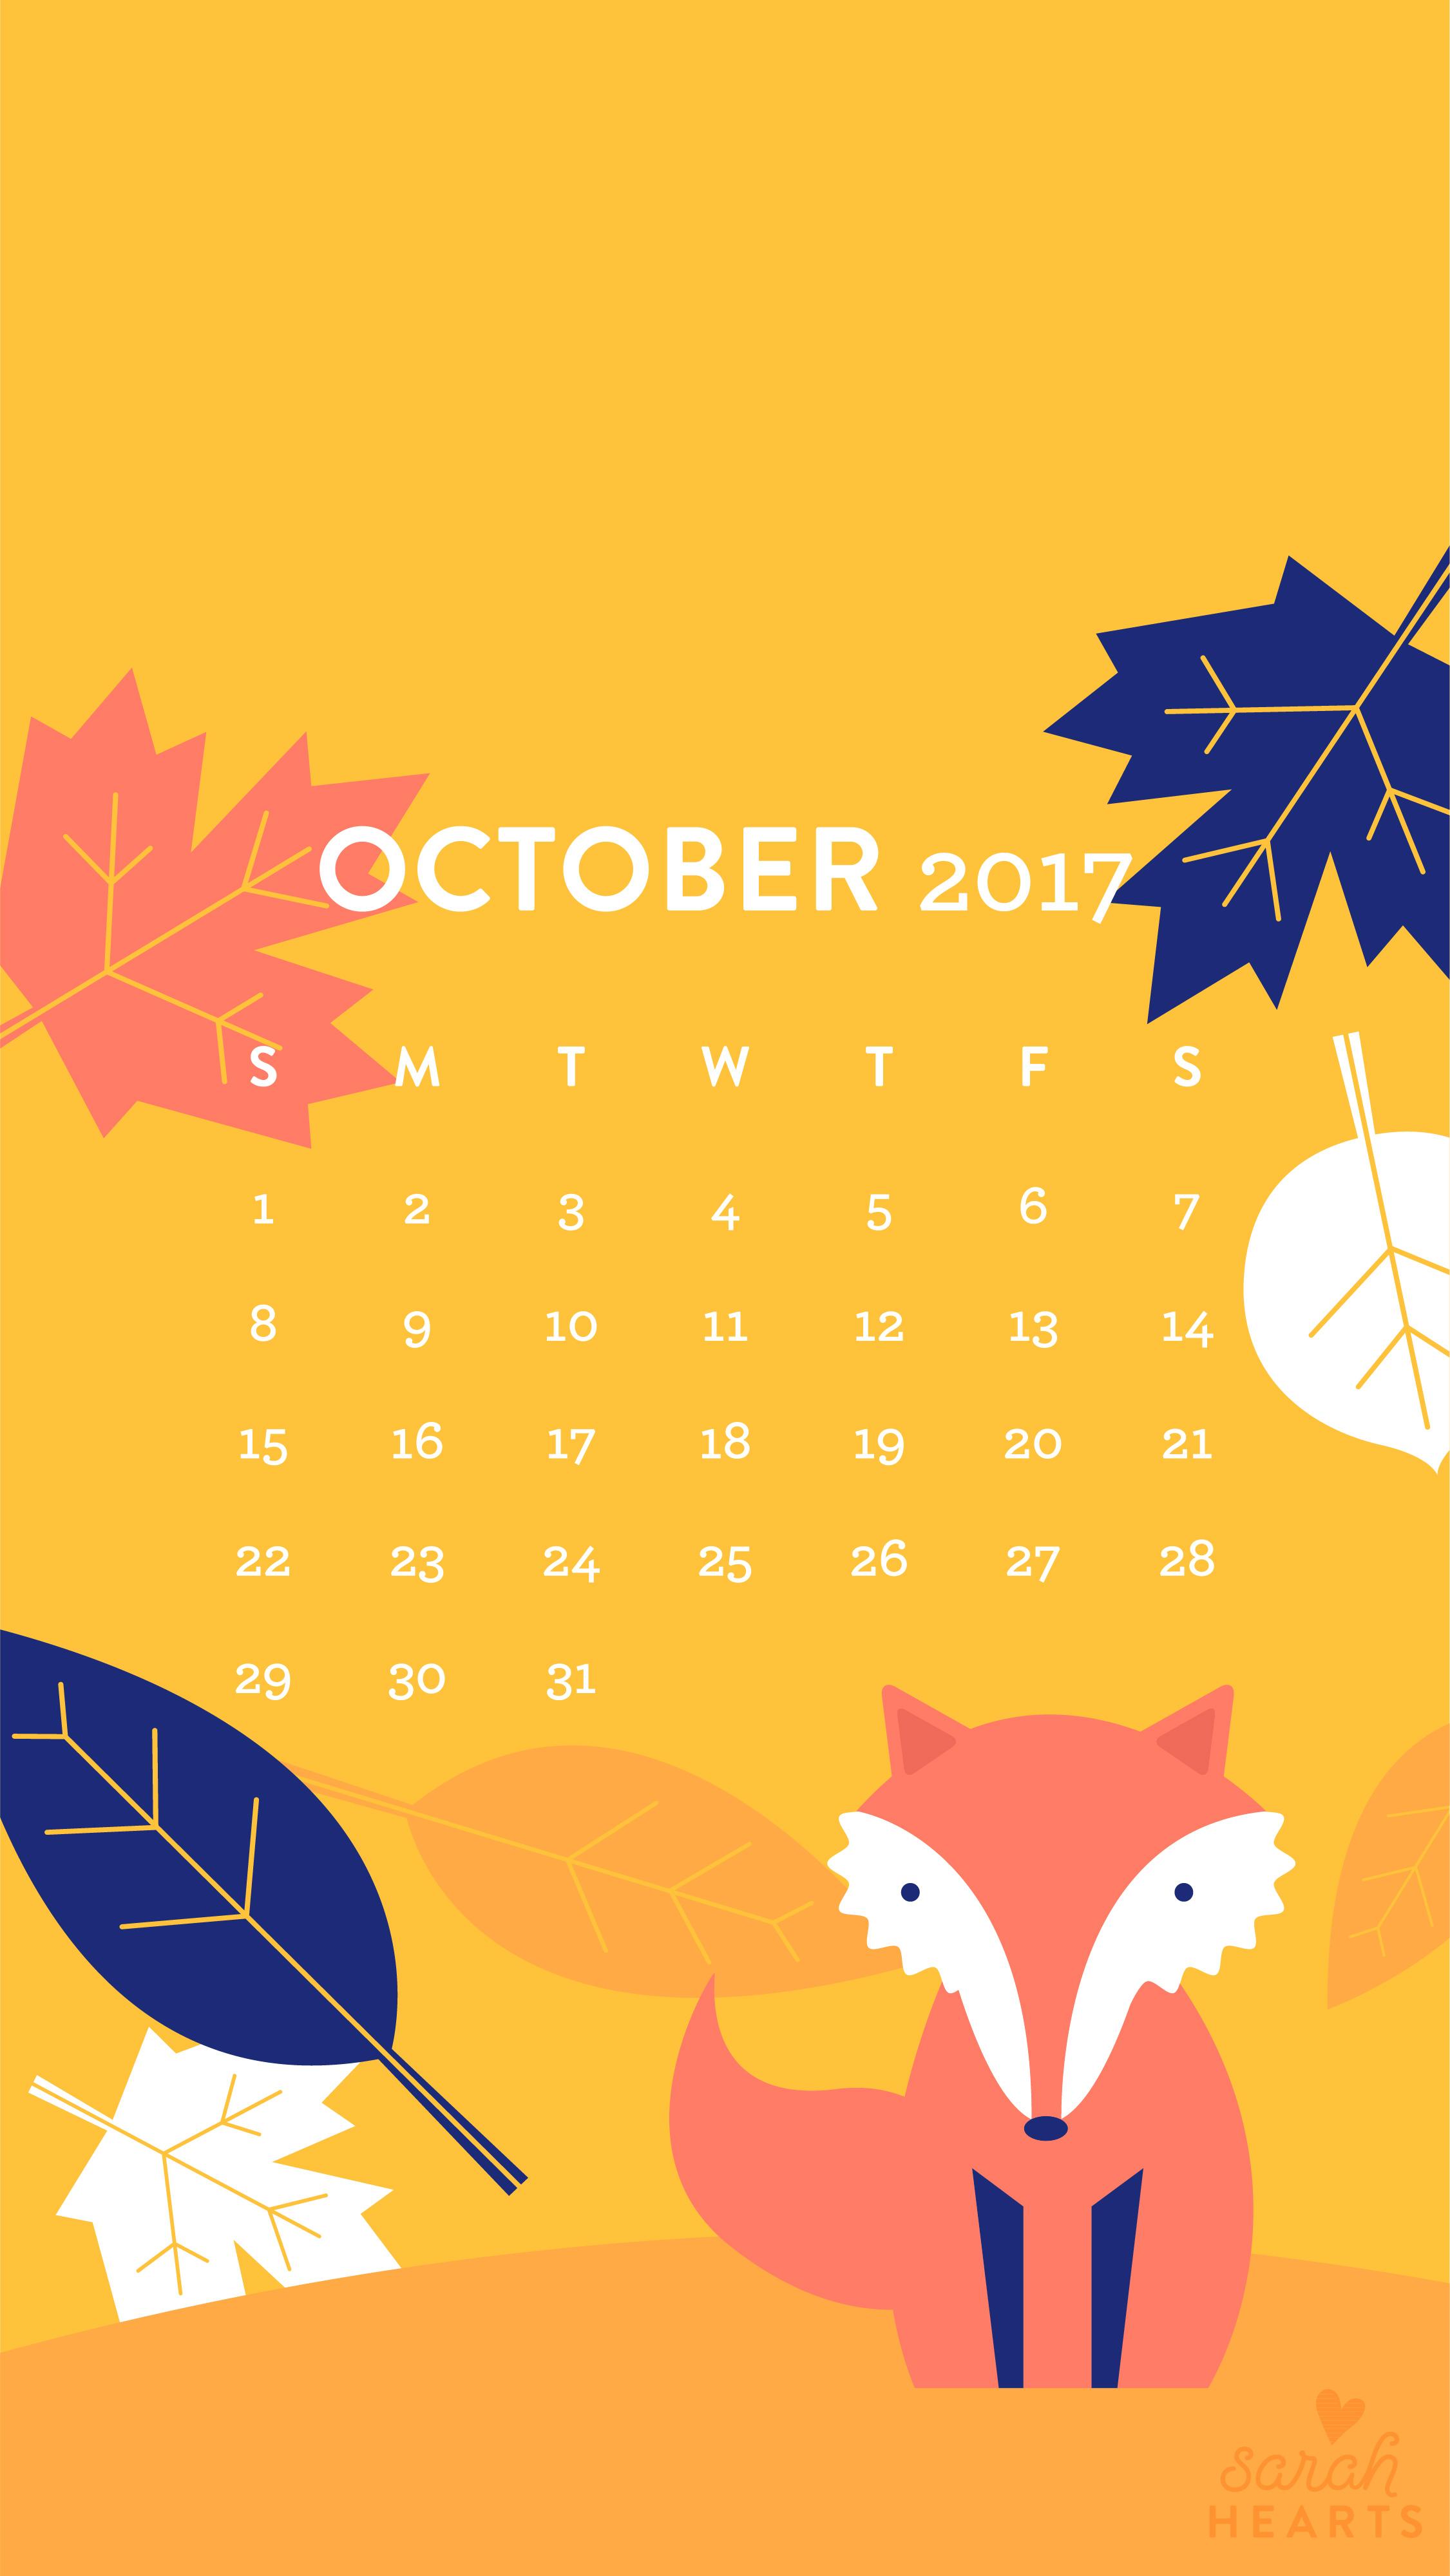 Fall Leaf And Fox October 2017 Calendar Wallpaper Sarah Hearts